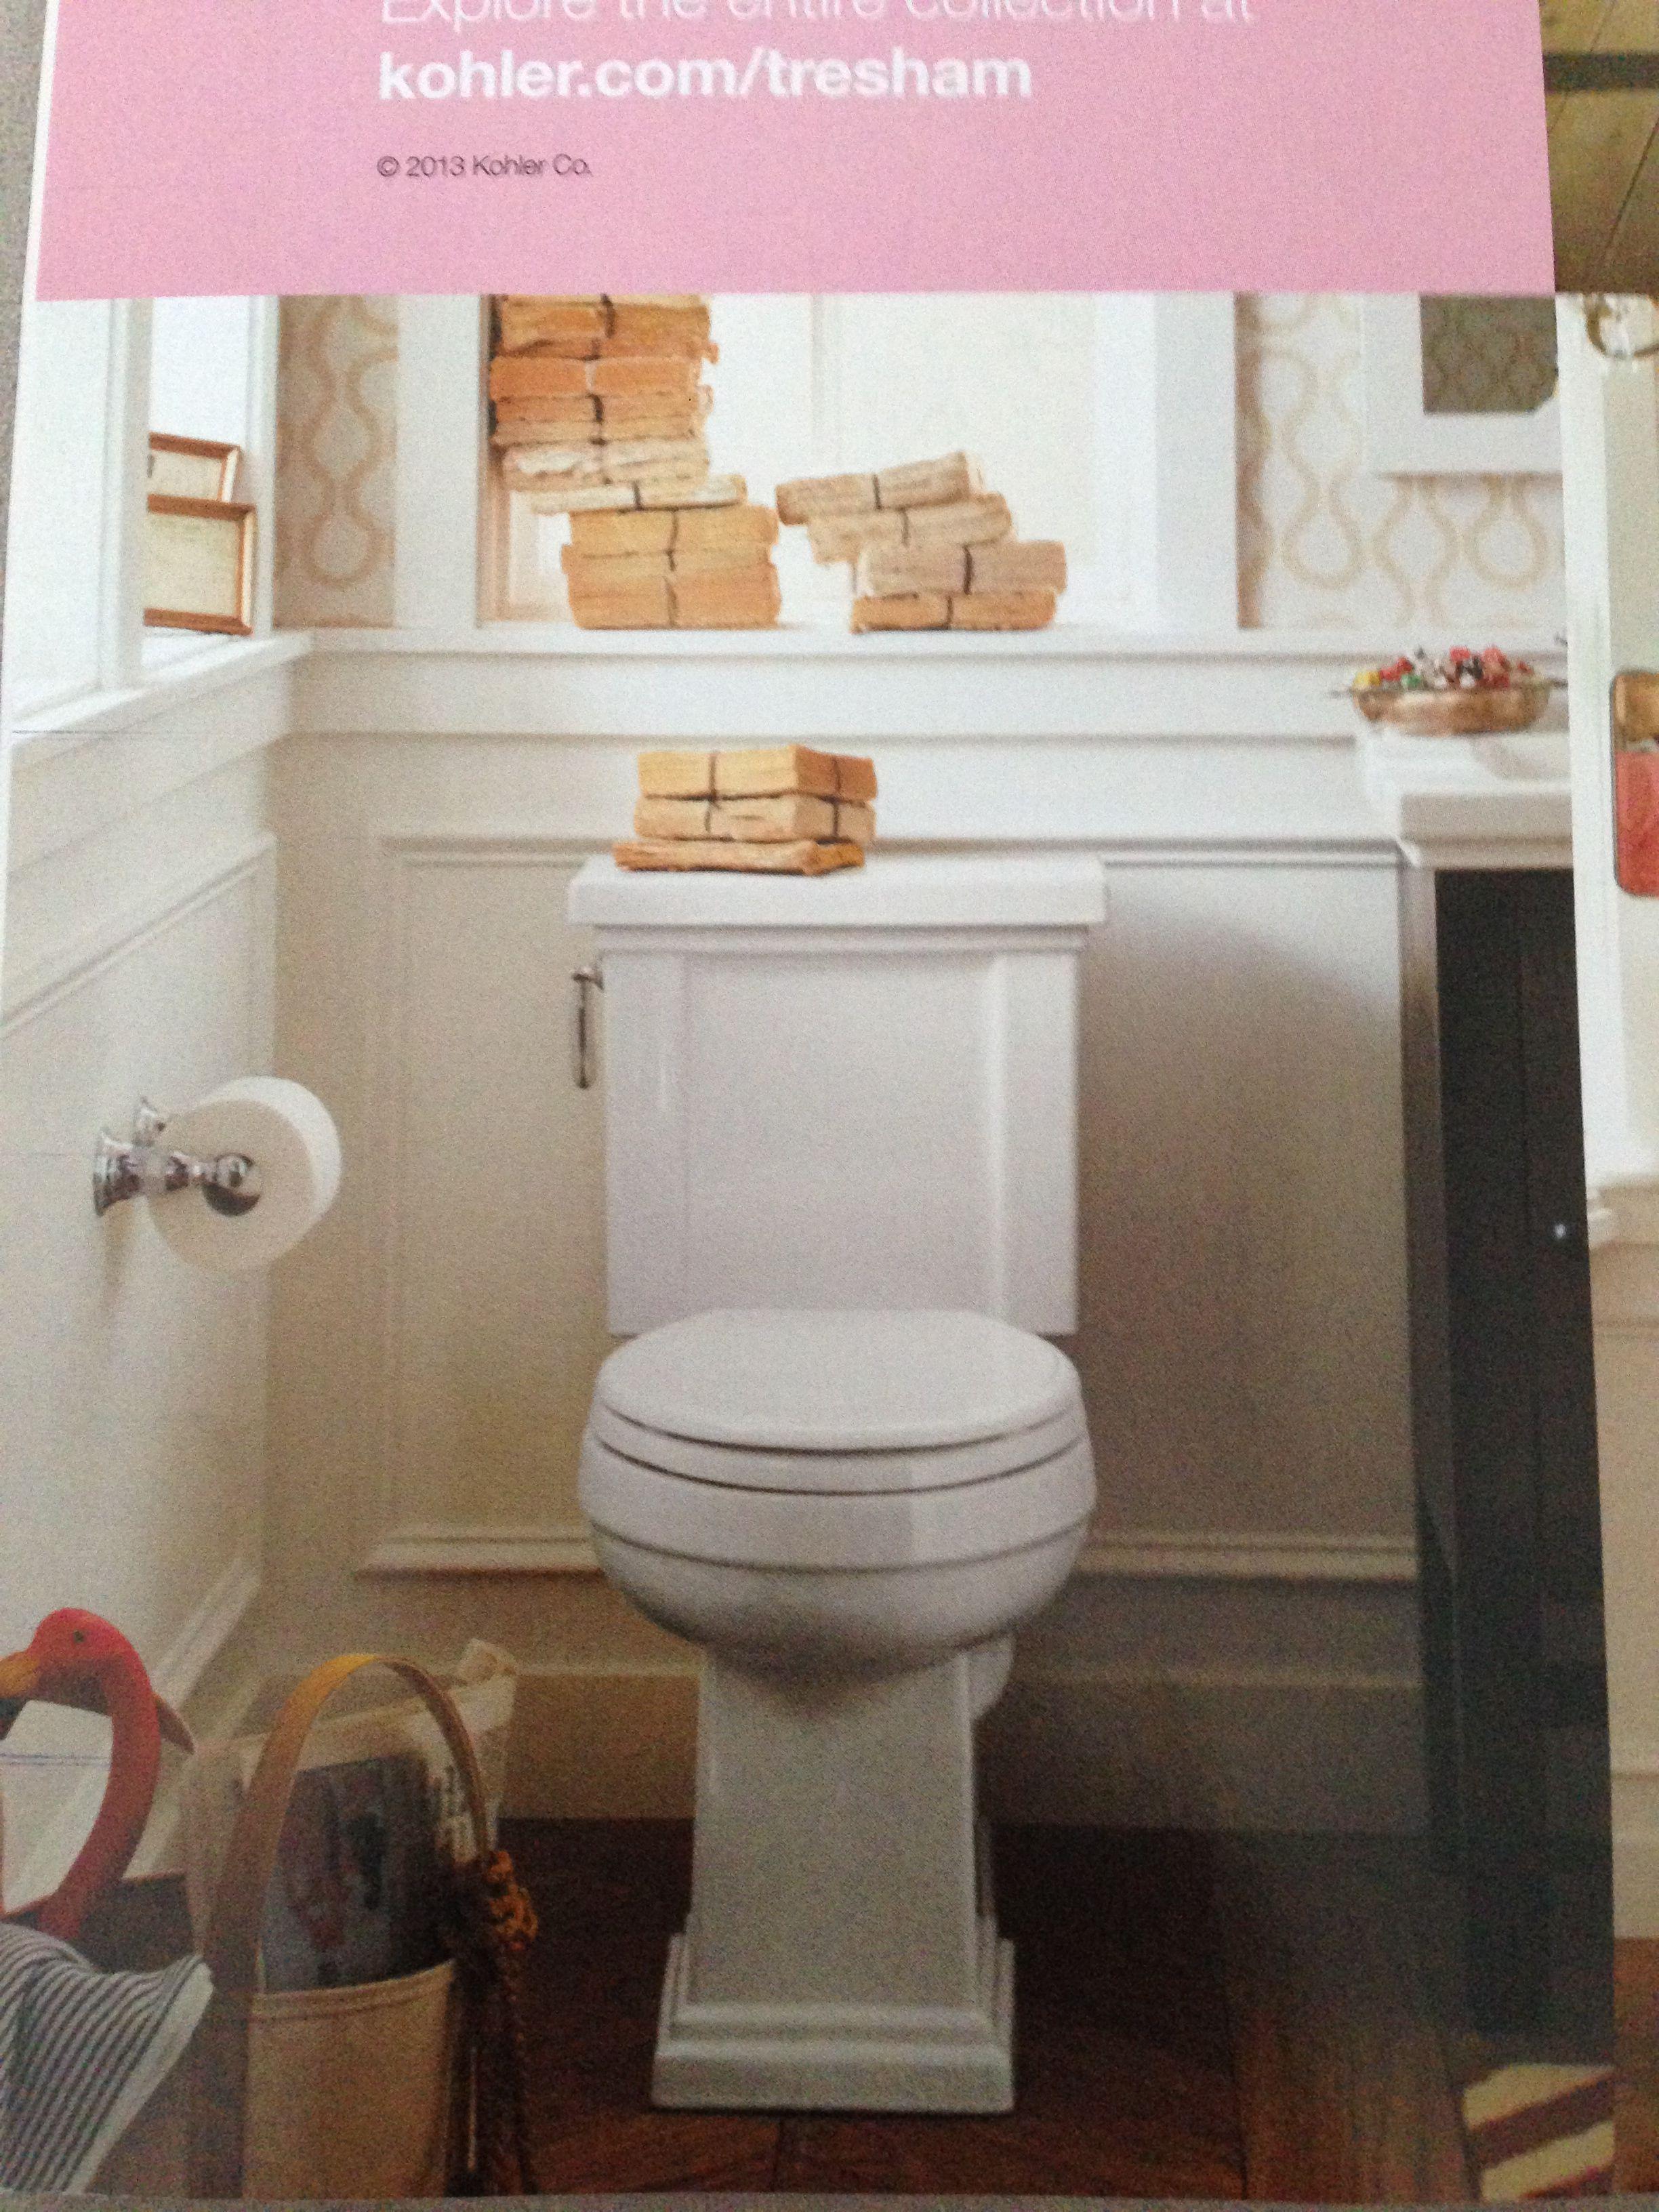 Toilet Kohler Bathroom Renovation Bathrooms Remodel Small Bathroom